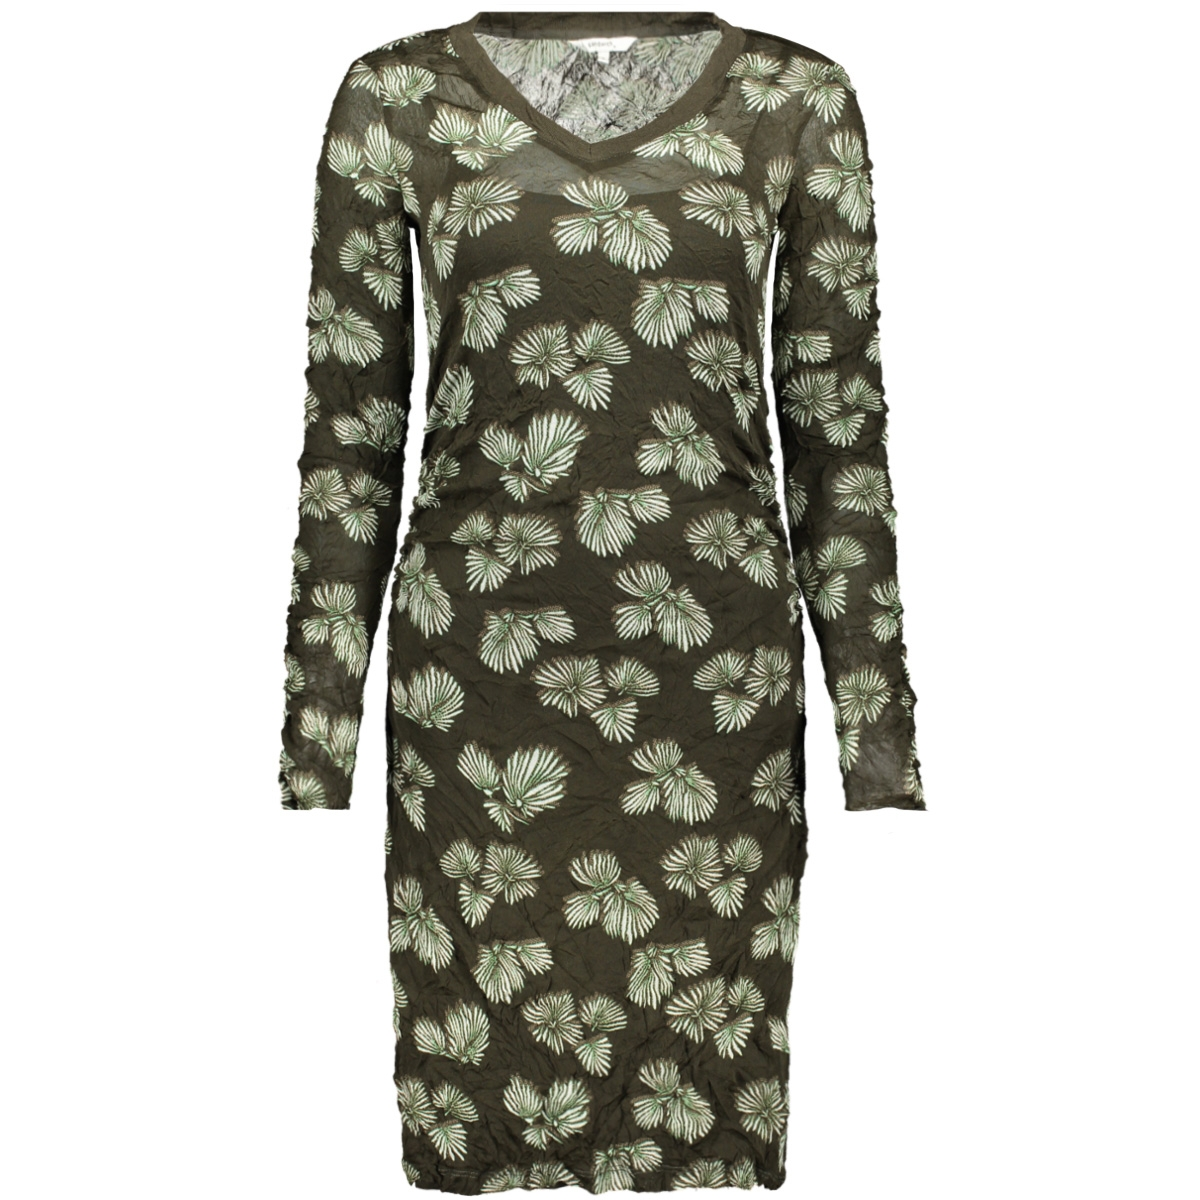 jurk met print 23001448 sandwich jurk 59046